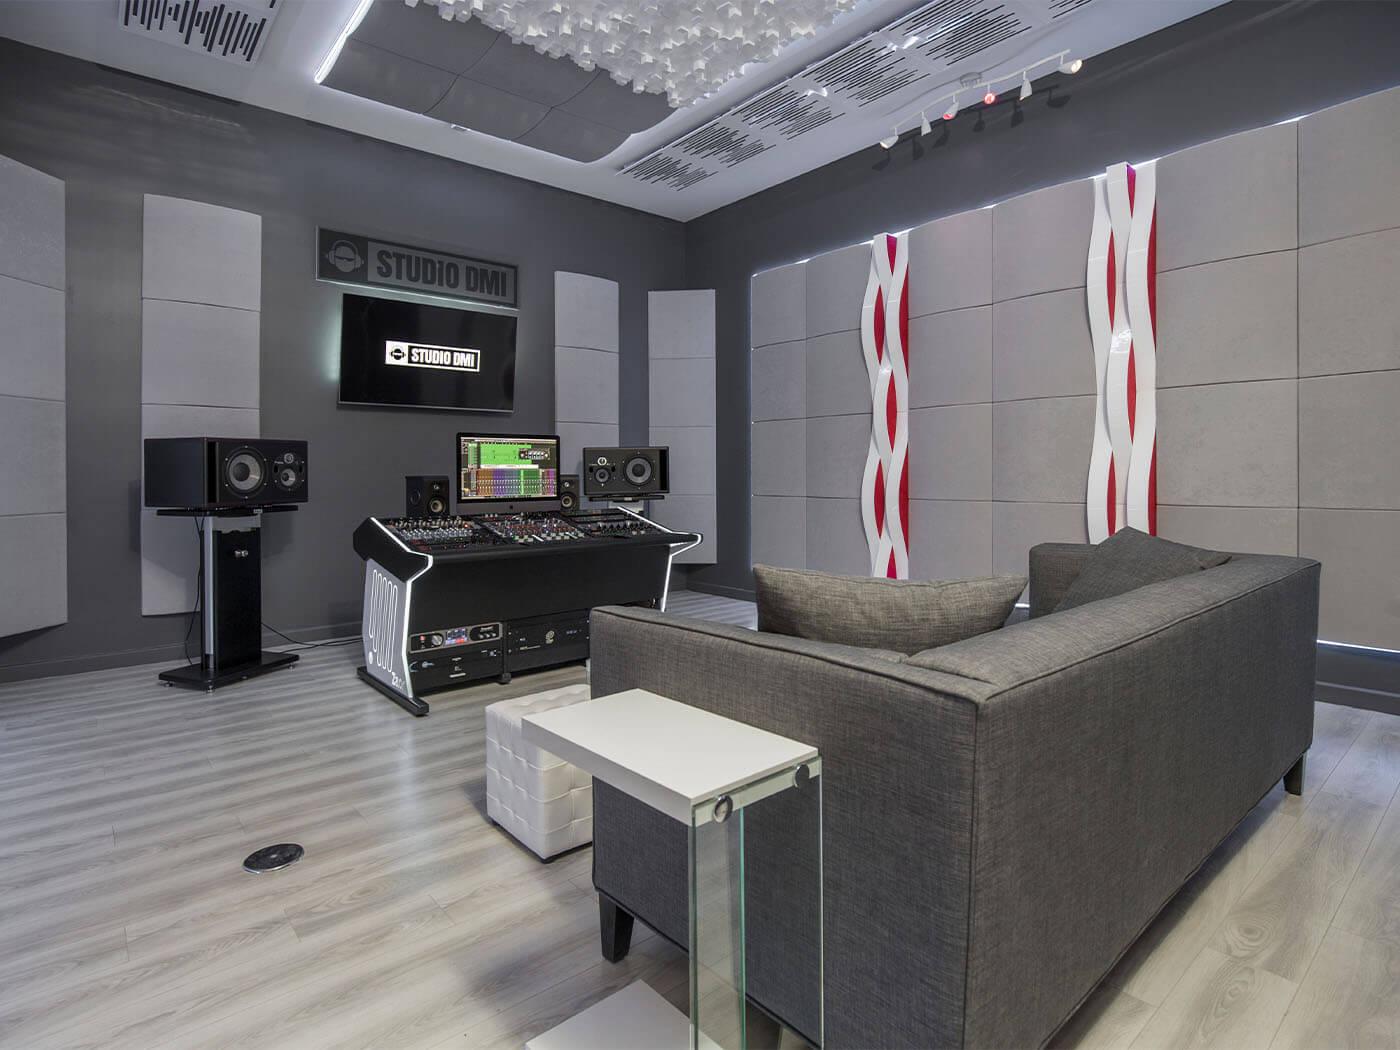 Studio DMI Studio I hero